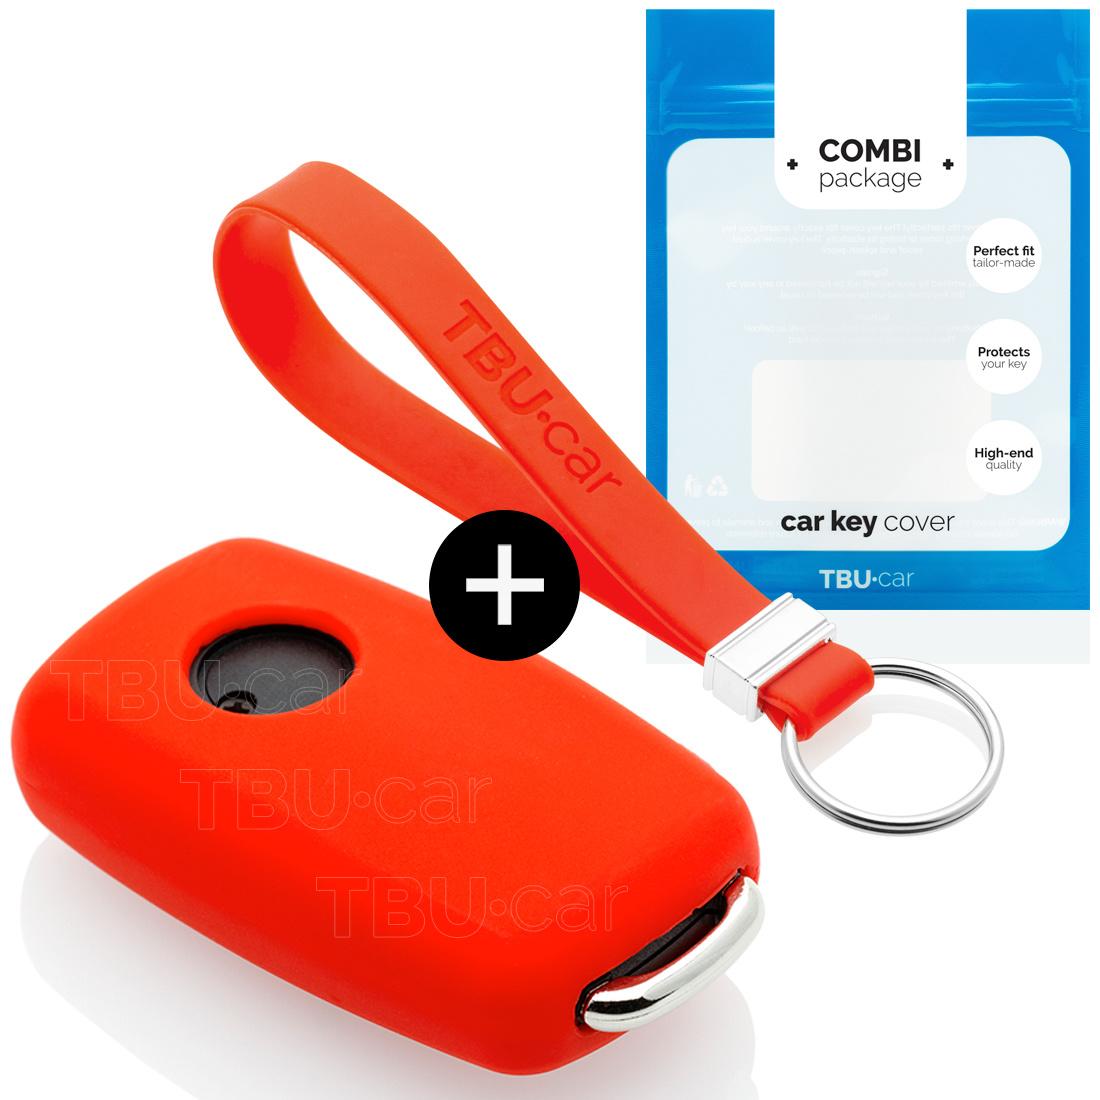 TBU car TBU car Autoschlüssel Hülle kompatibel mit Skoda 2 Tasten - Schutzhülle aus Silikon - Auto Schlüsselhülle Cover in Rot